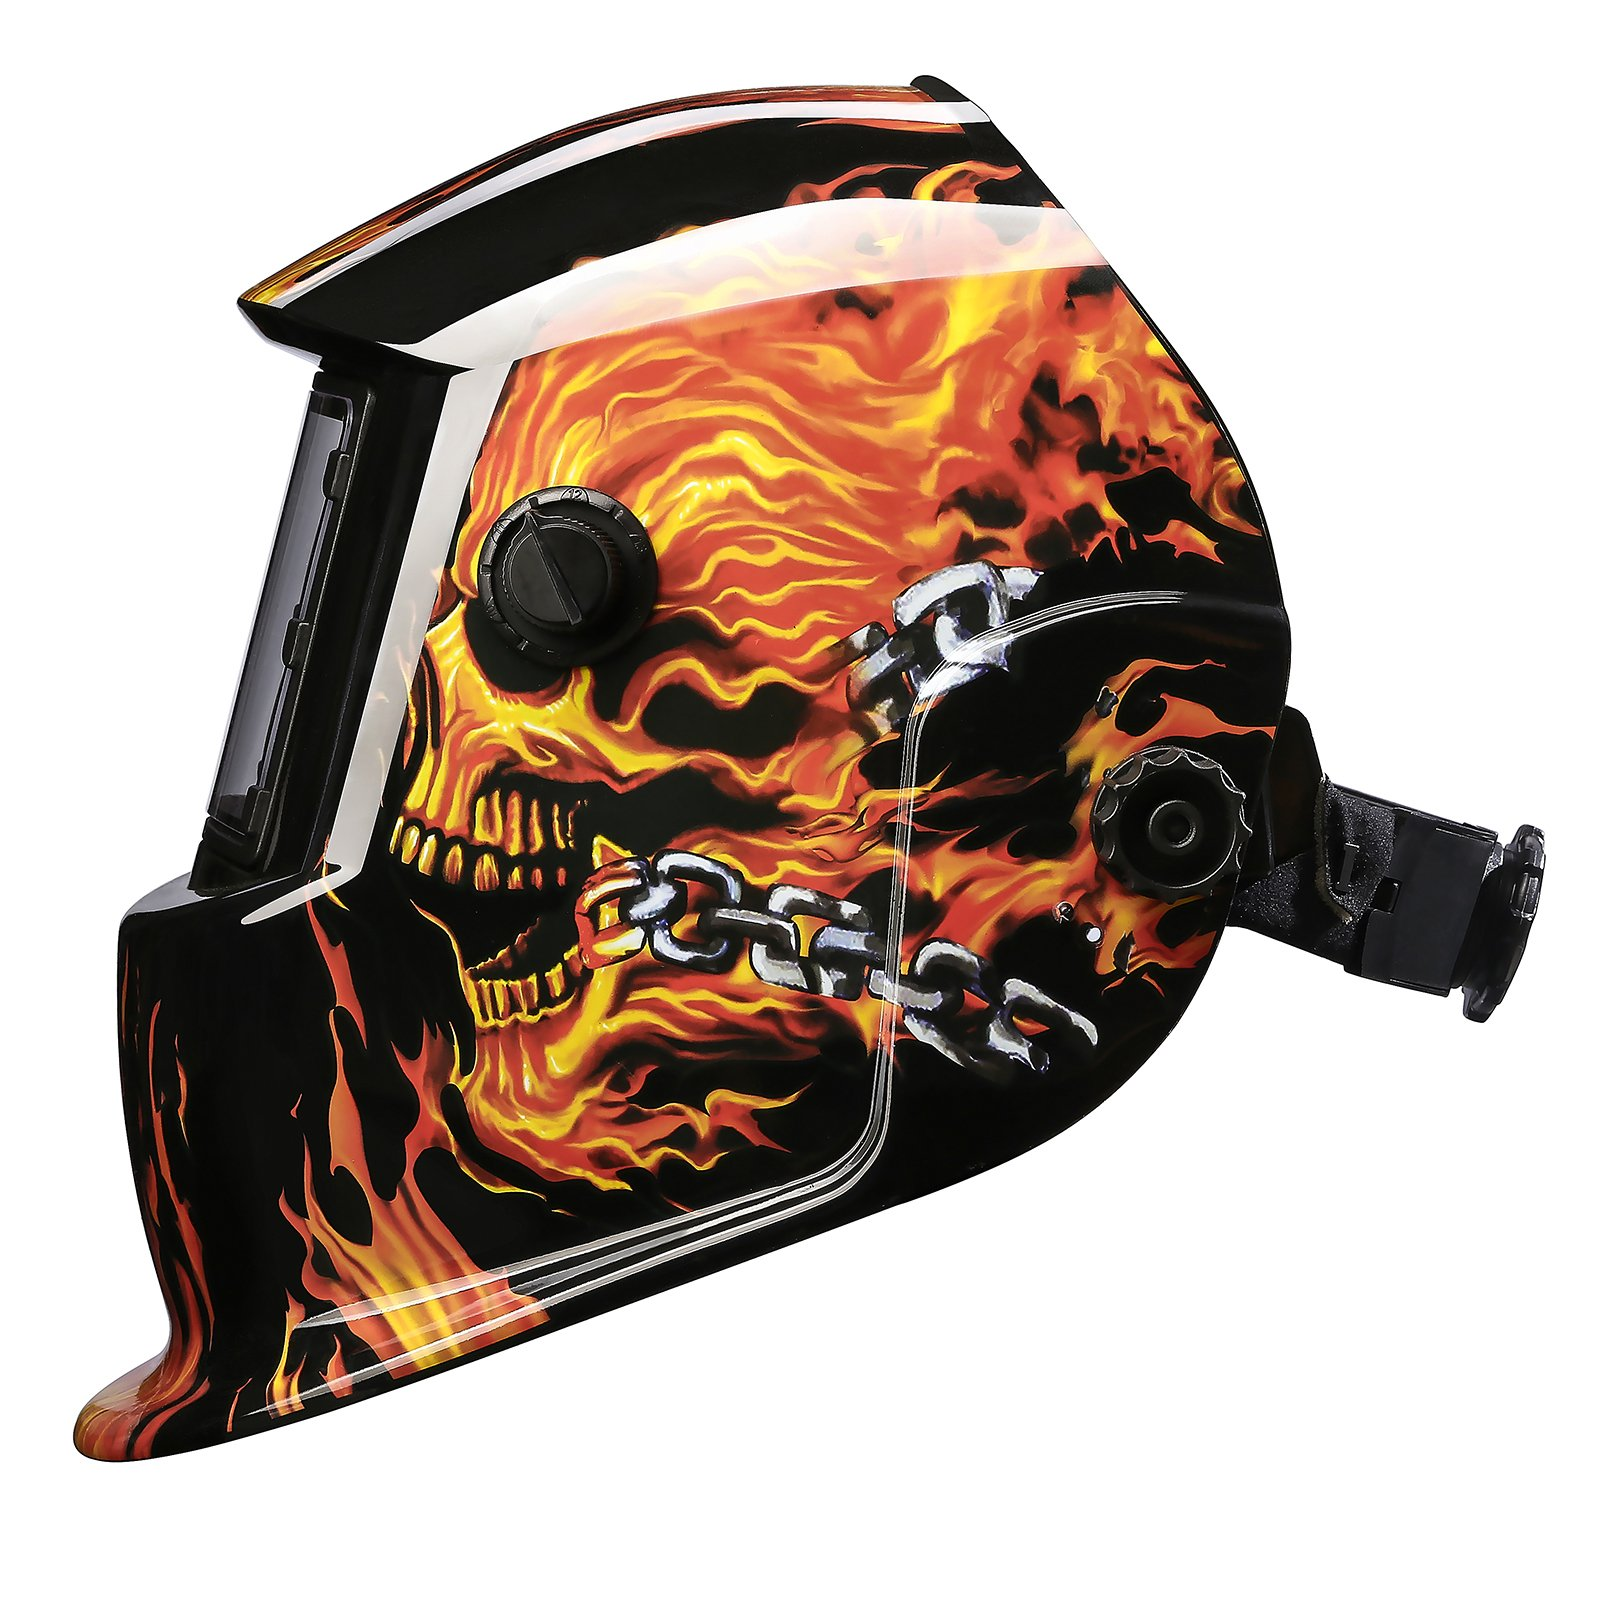 Solar Powered Welding Helmet Auto Darkening Professional Hood with Wide Lens Adjustable Shade Range by DEKOPRO (Image #4)